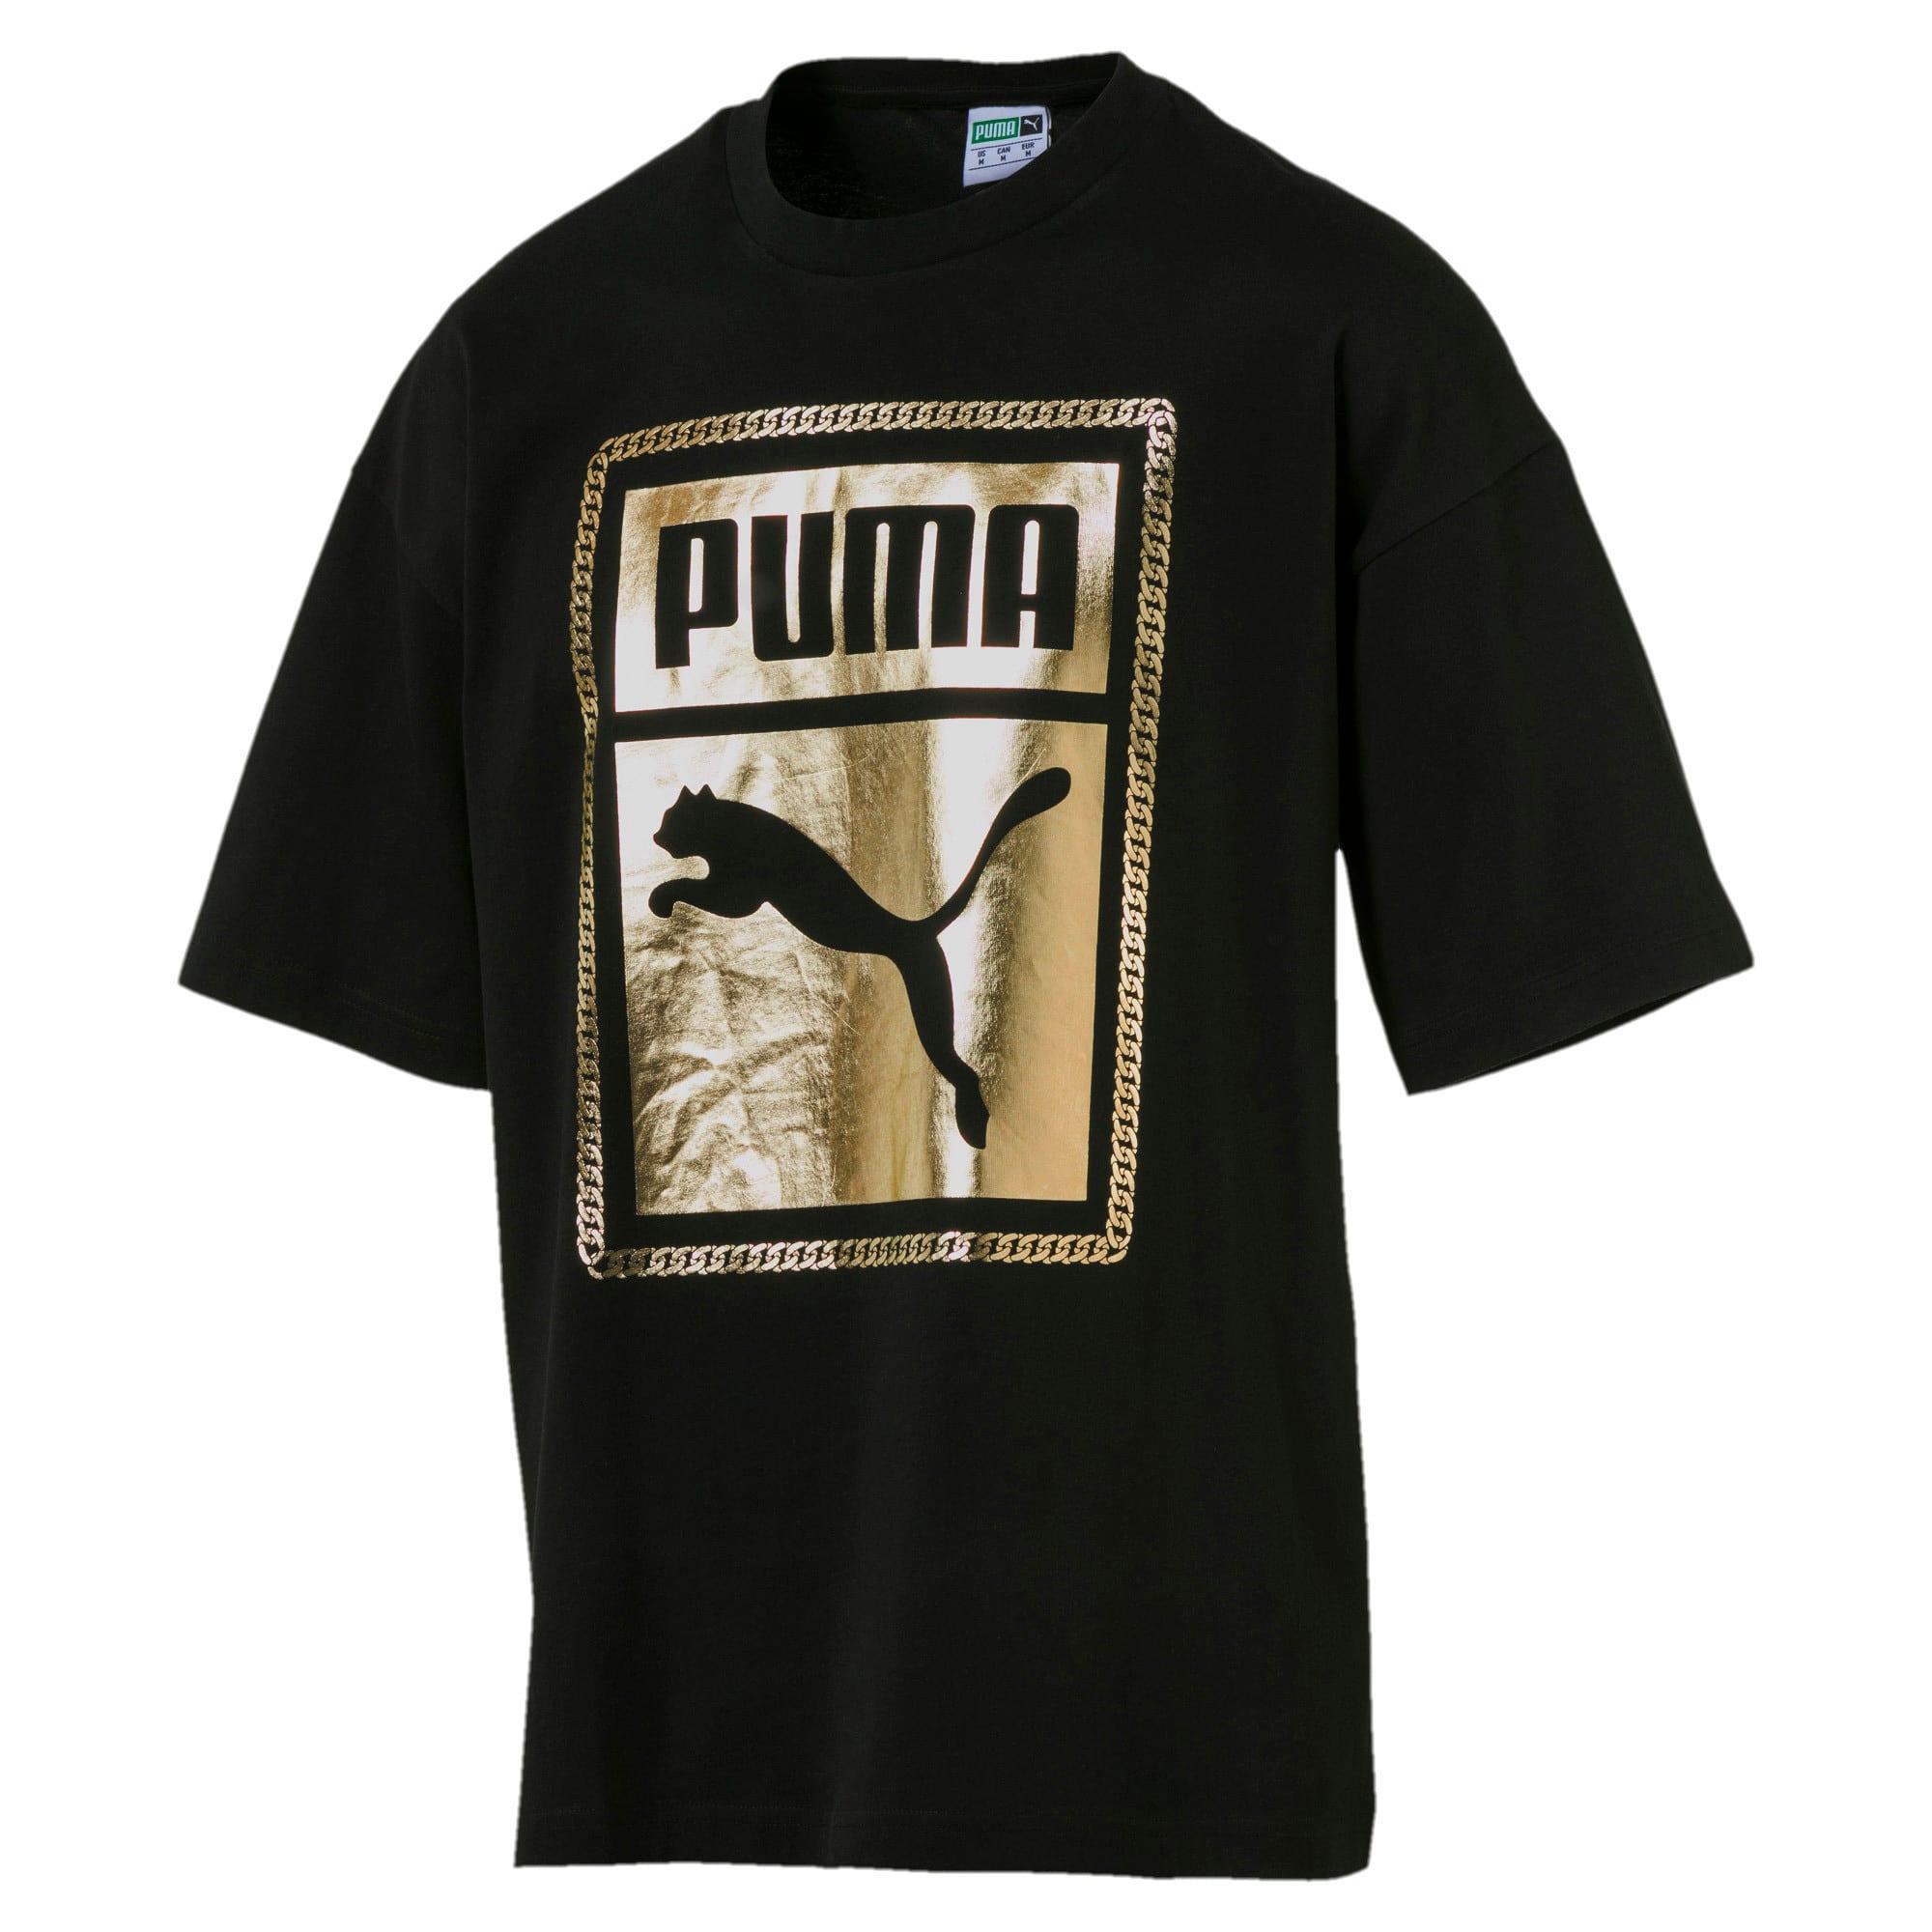 Thumbnail 1 of Chains Men's Tee, Puma Black-1, medium